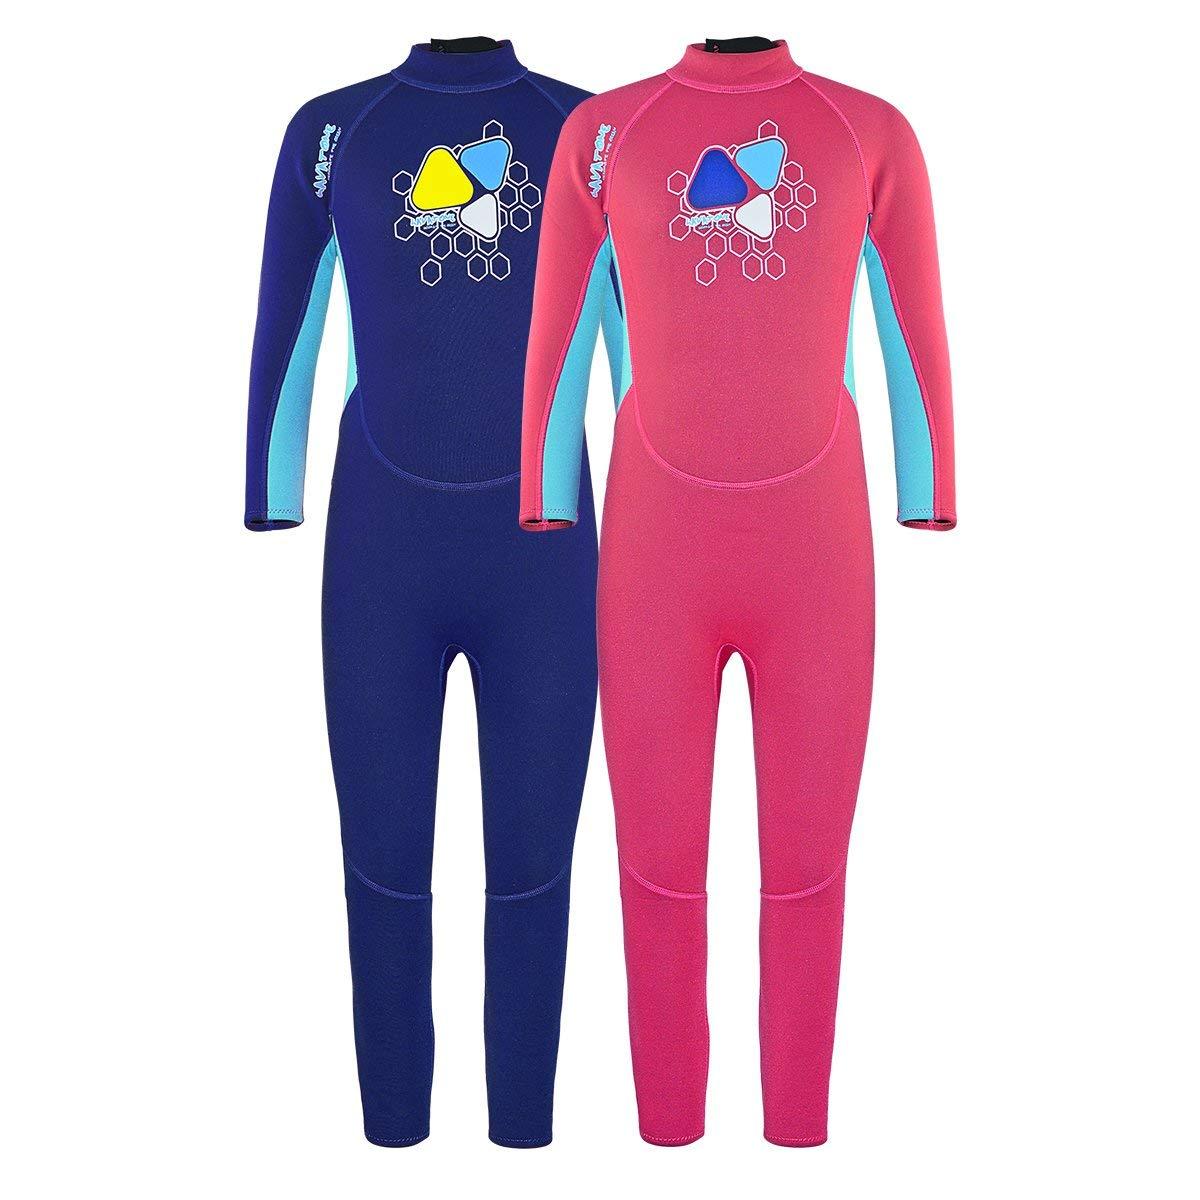 8bb797dc3c Get Quotations · Layatone Wetsuit Kids Premium 2mm Neoprene Wetsuit for  Girl Boy Full Body Diving Suit -UV